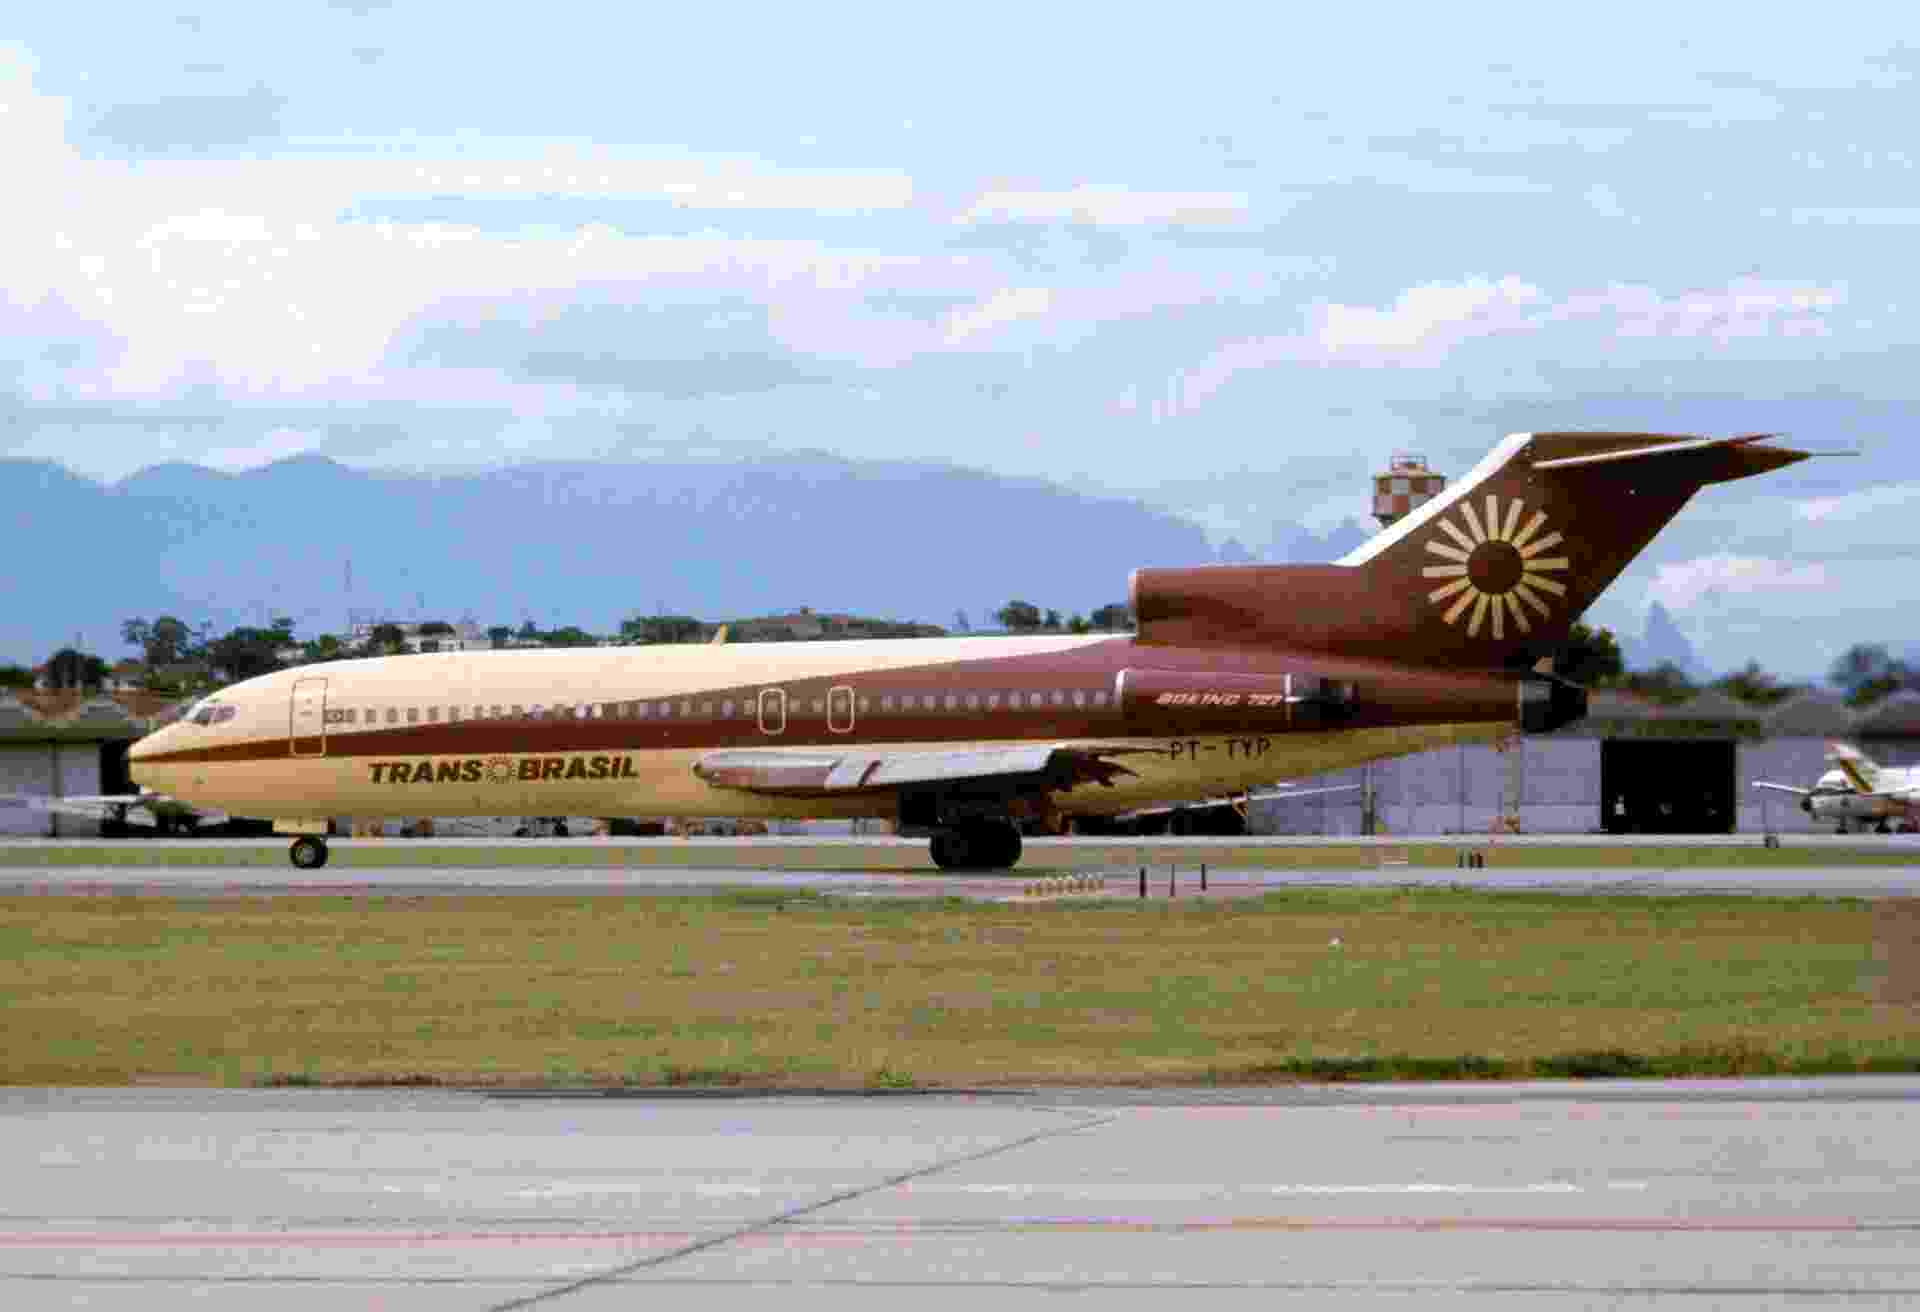 Primeiro projeto de pintura de avião foi feito aos 12 anos de idade para a TransBrasil - Gianfranco Beting